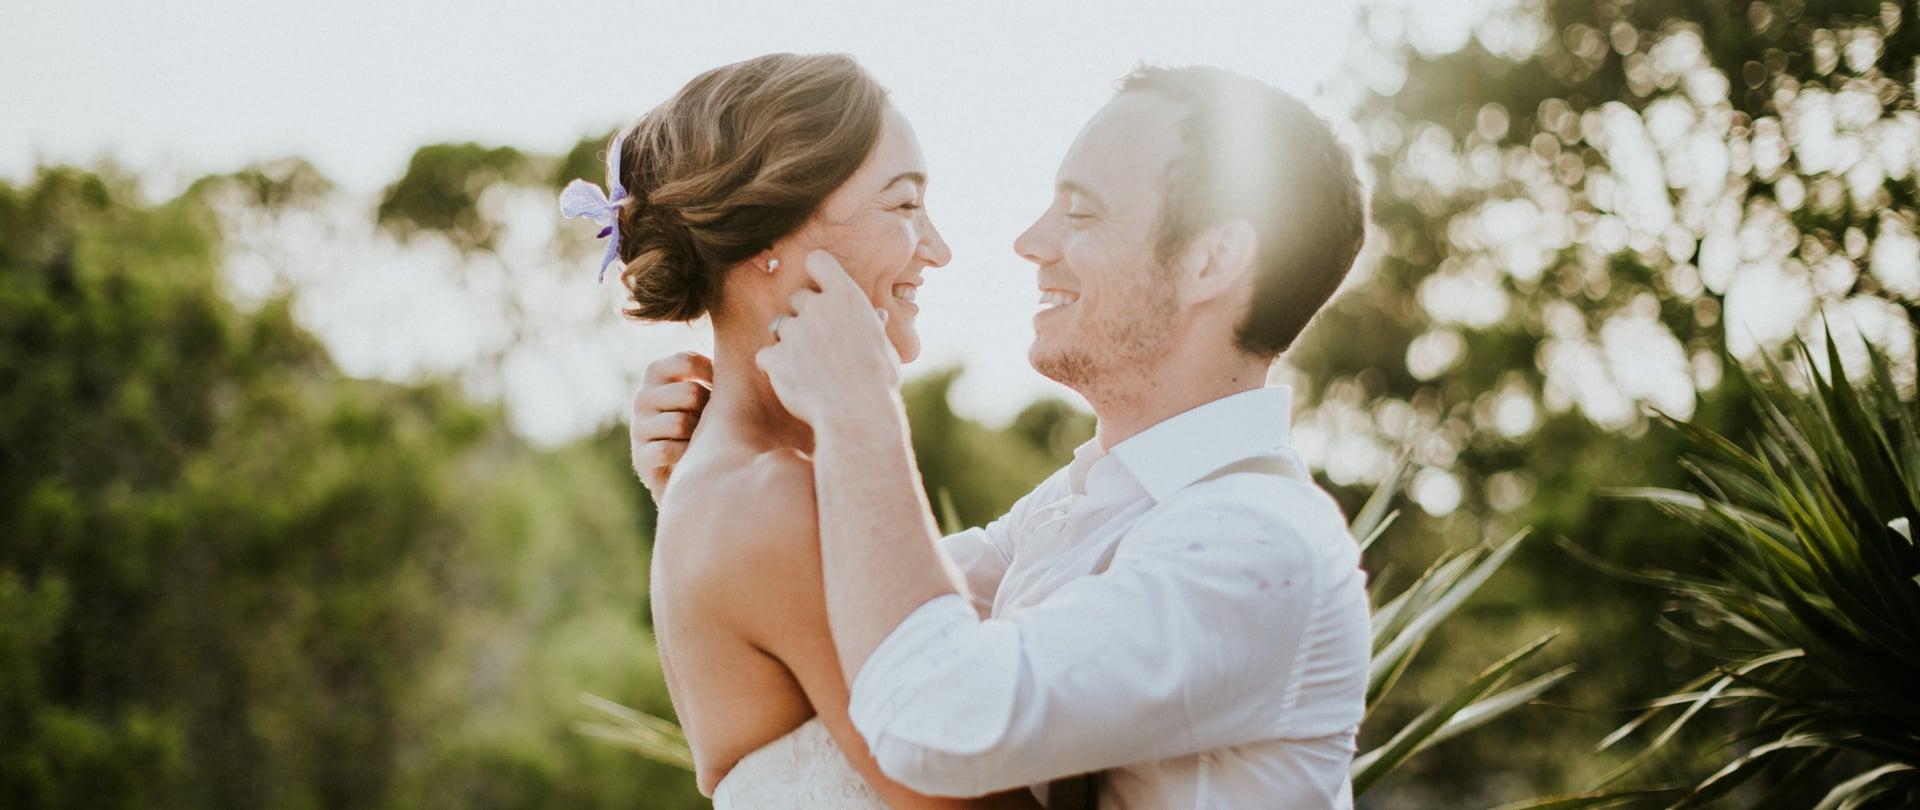 Laura & Jonathan Wedding Video Filmed at Ibiza, Spain